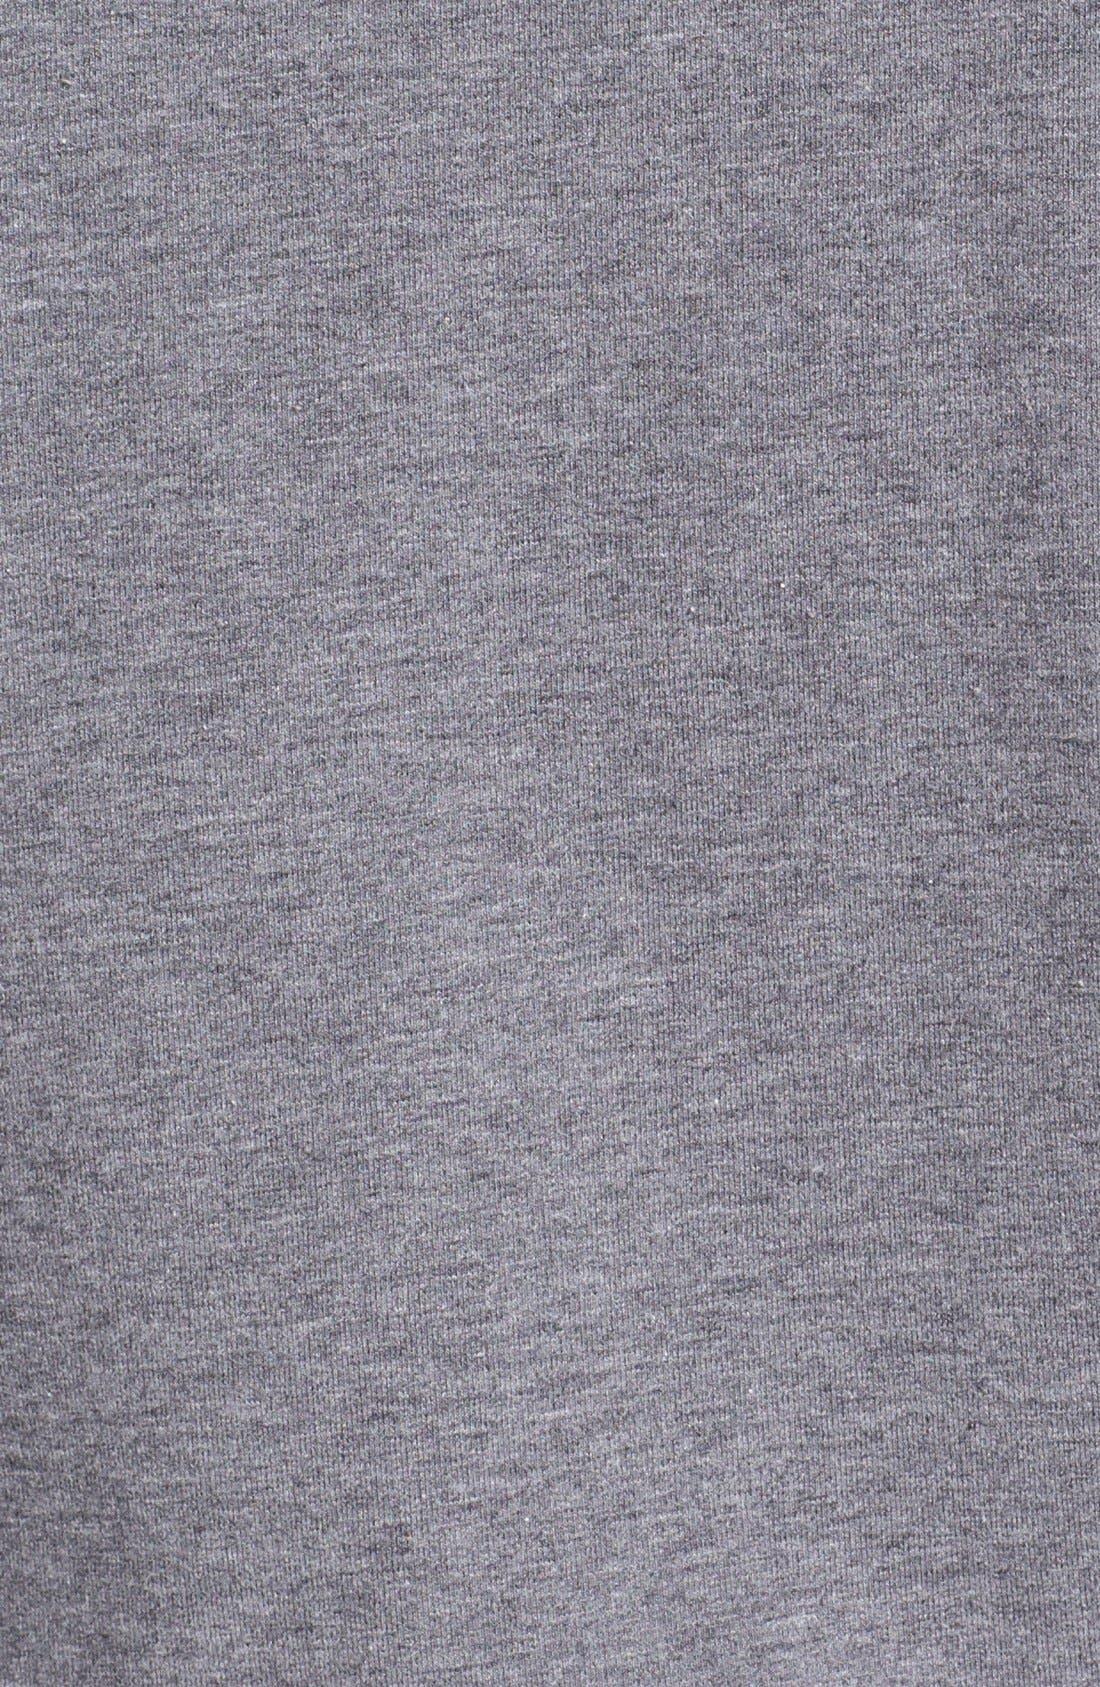 Alternate Image 3  - Michael Kors Quilted Hooded Vest